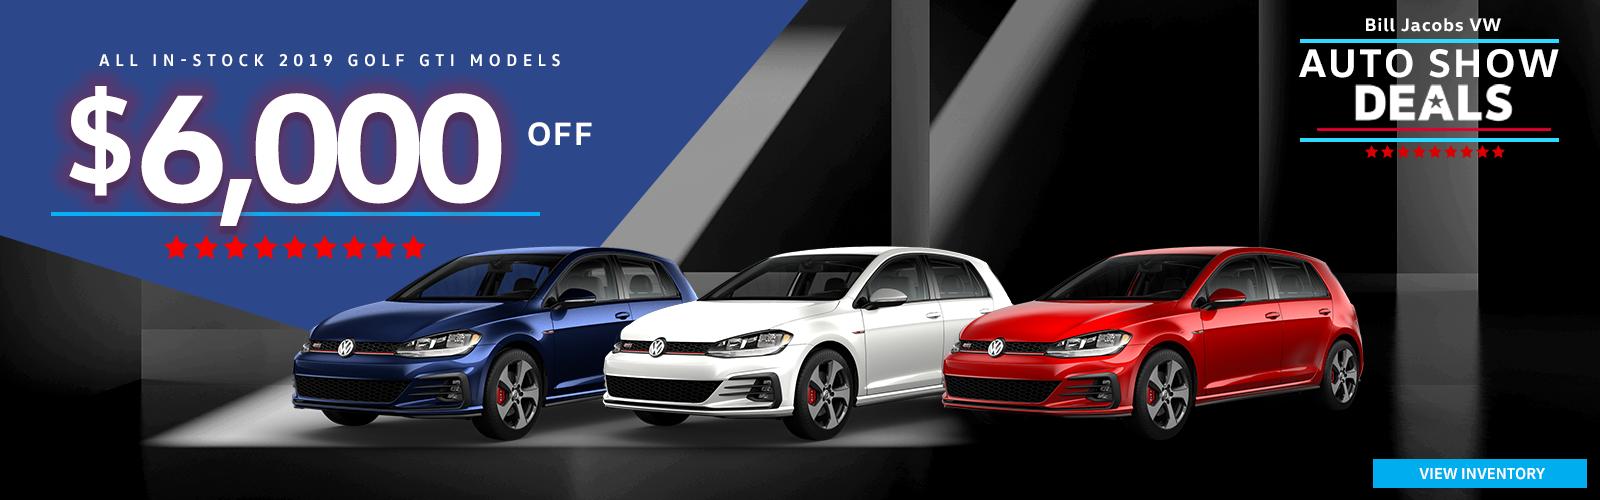 $6,000 off all-in-stock 2019 Volkswagen GTI